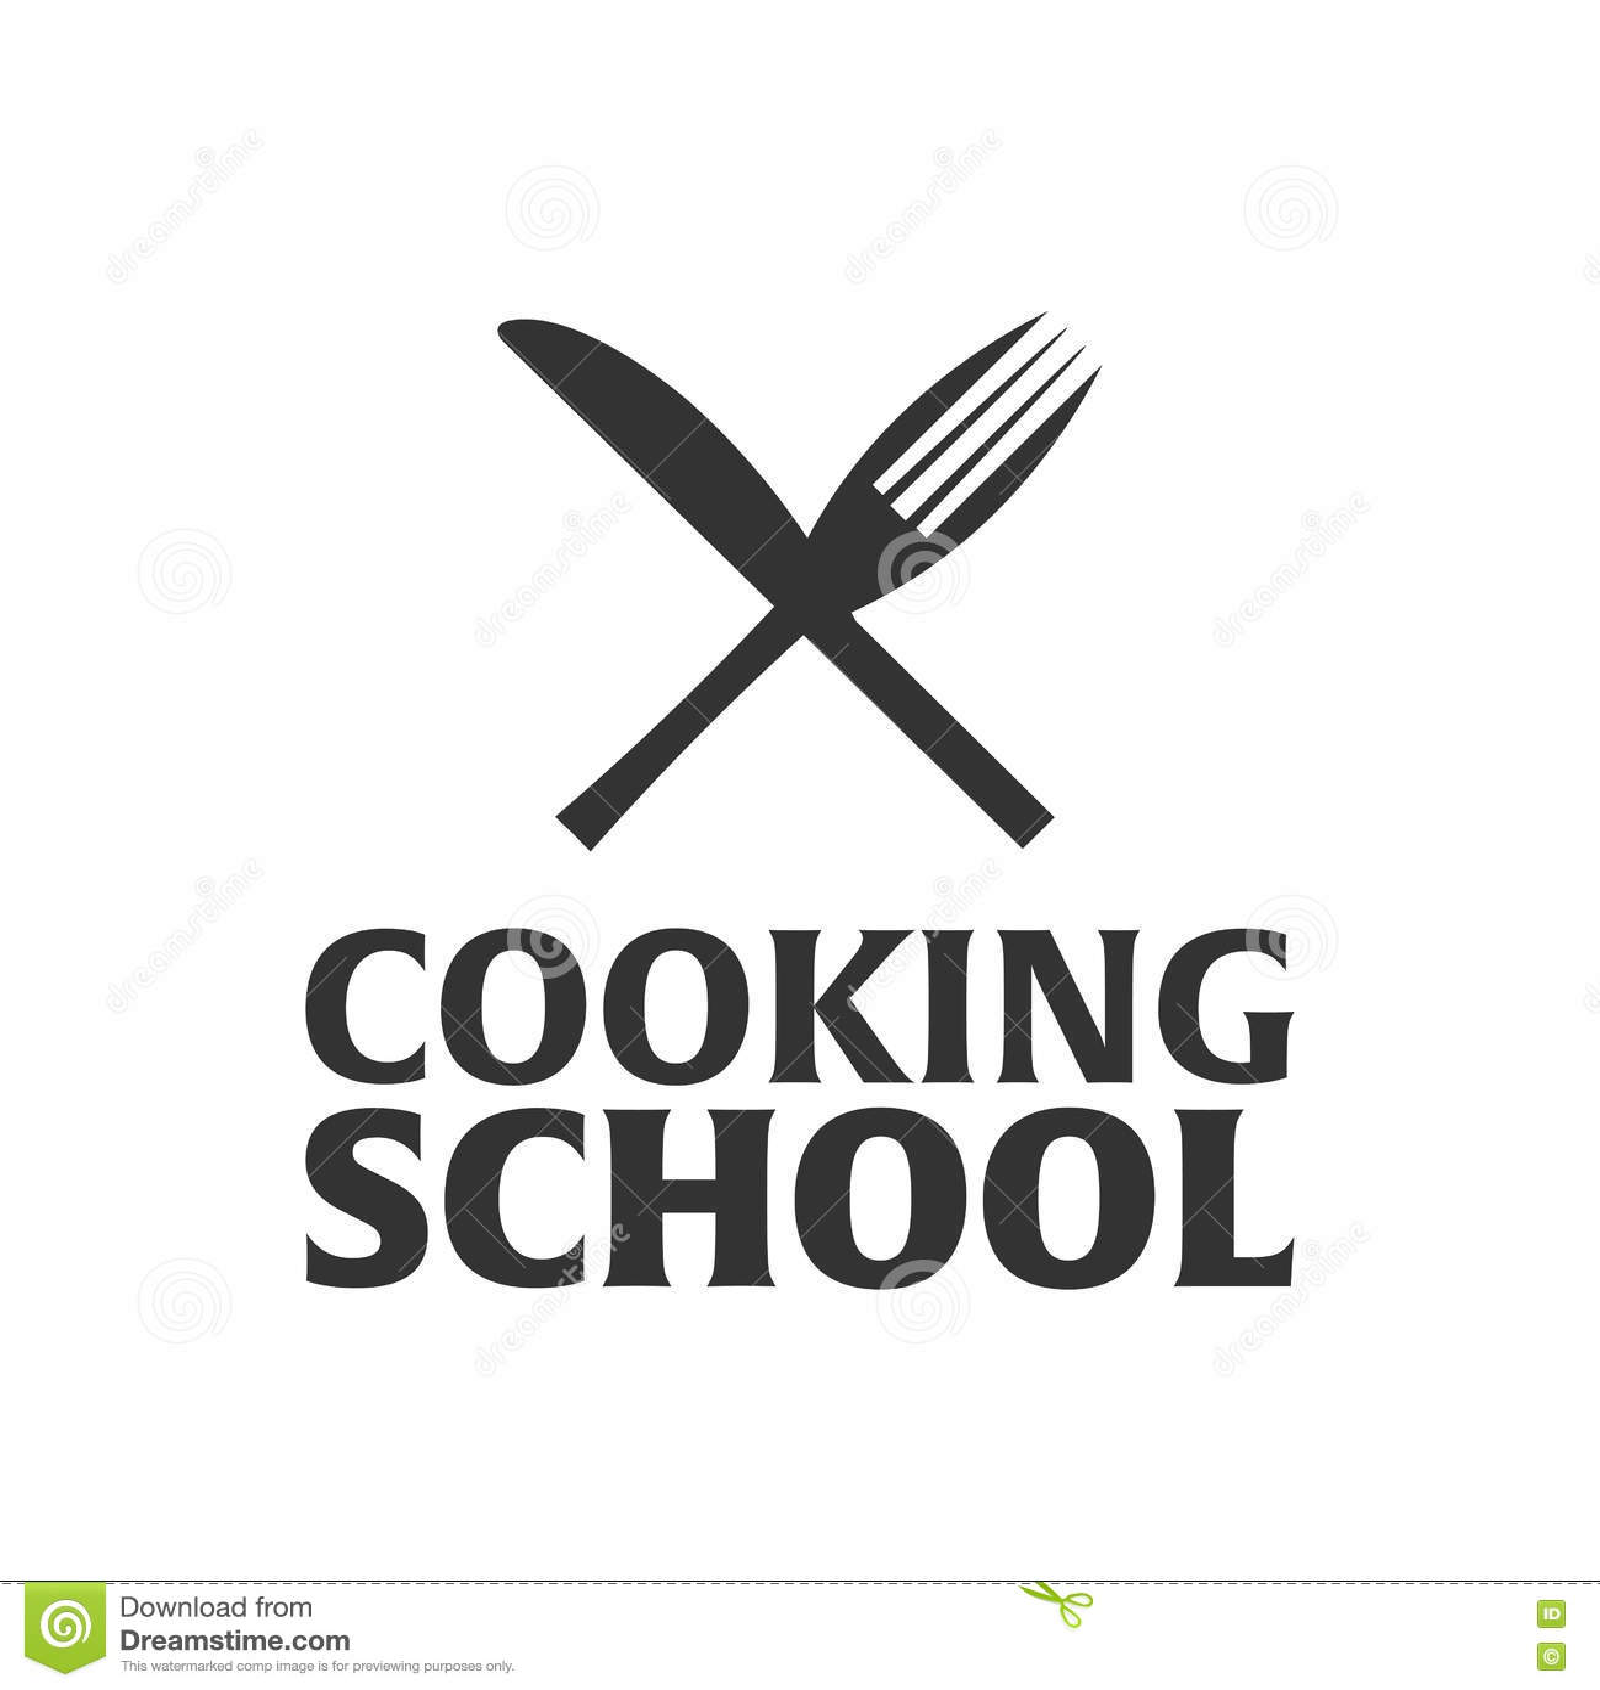 Cooking school logo. Cooking Academy. Vector illustration.